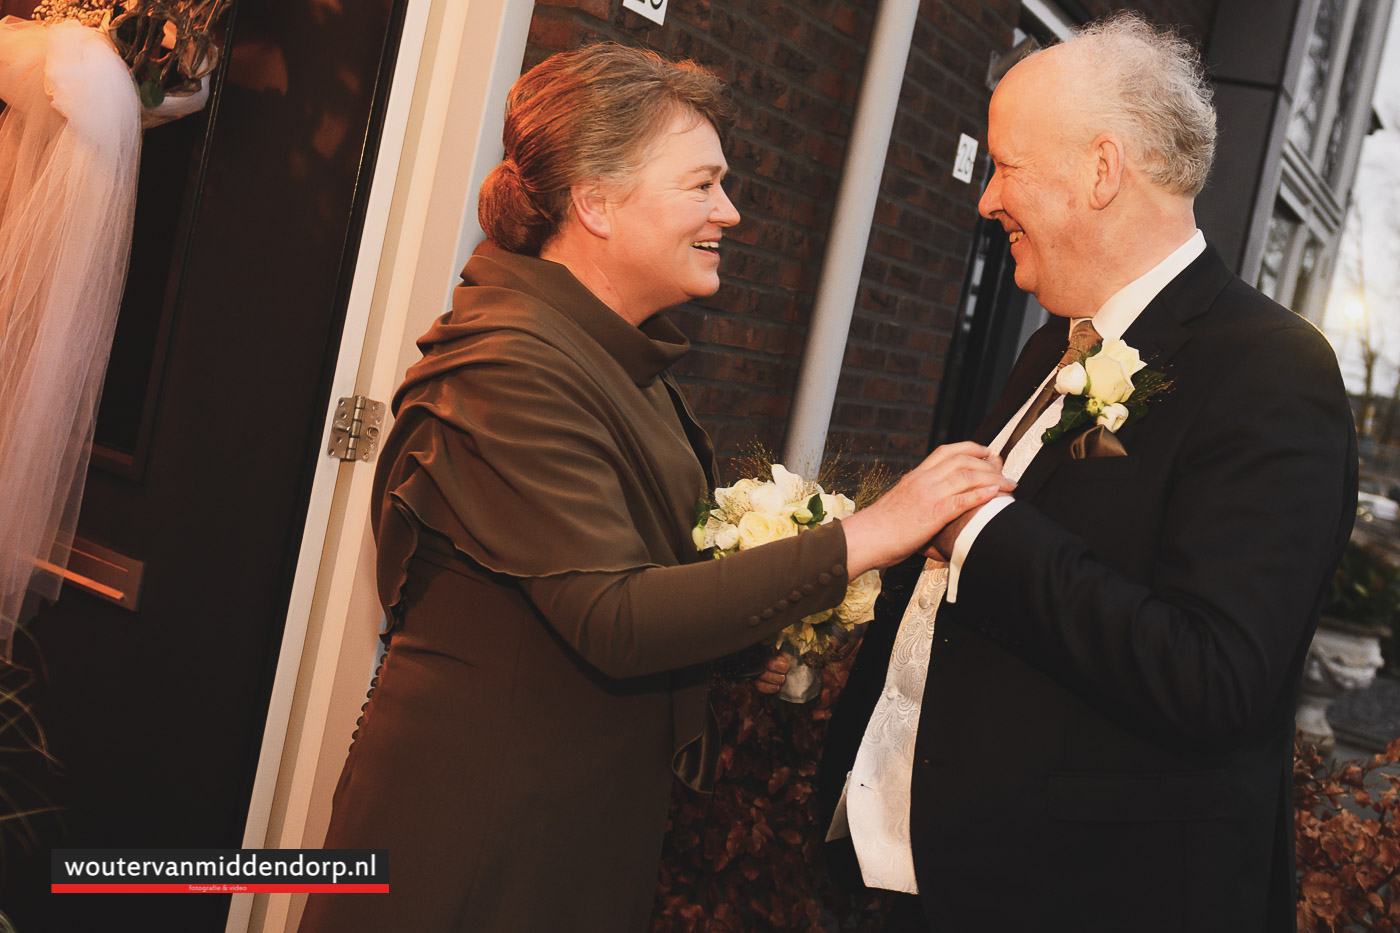 bruidsfotografie Wouter van Middendorp Uddel Elspeet Barneveld, omgeving trouwfotograaf-11